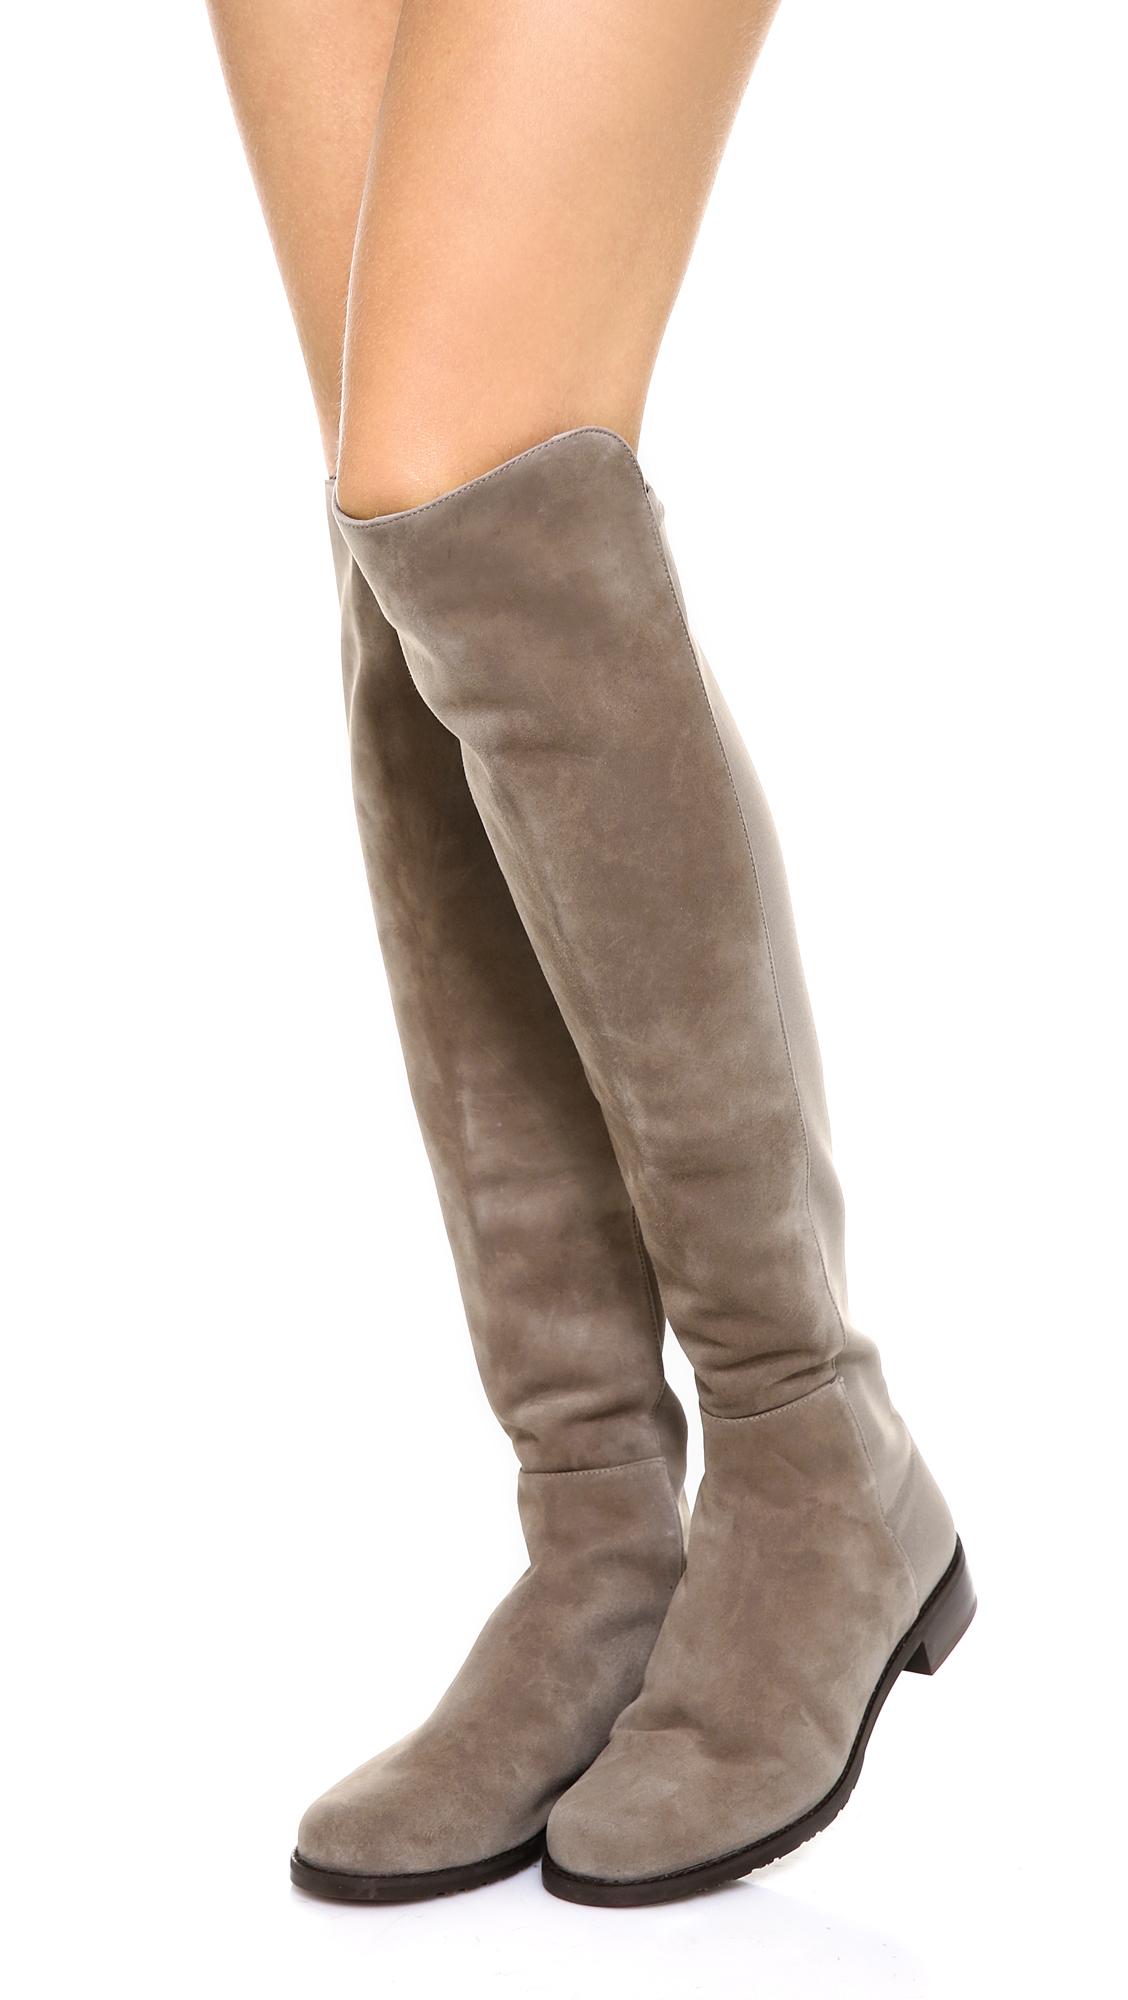 701521cc8f3 Stuart Weitzman 5050 Flat Boots